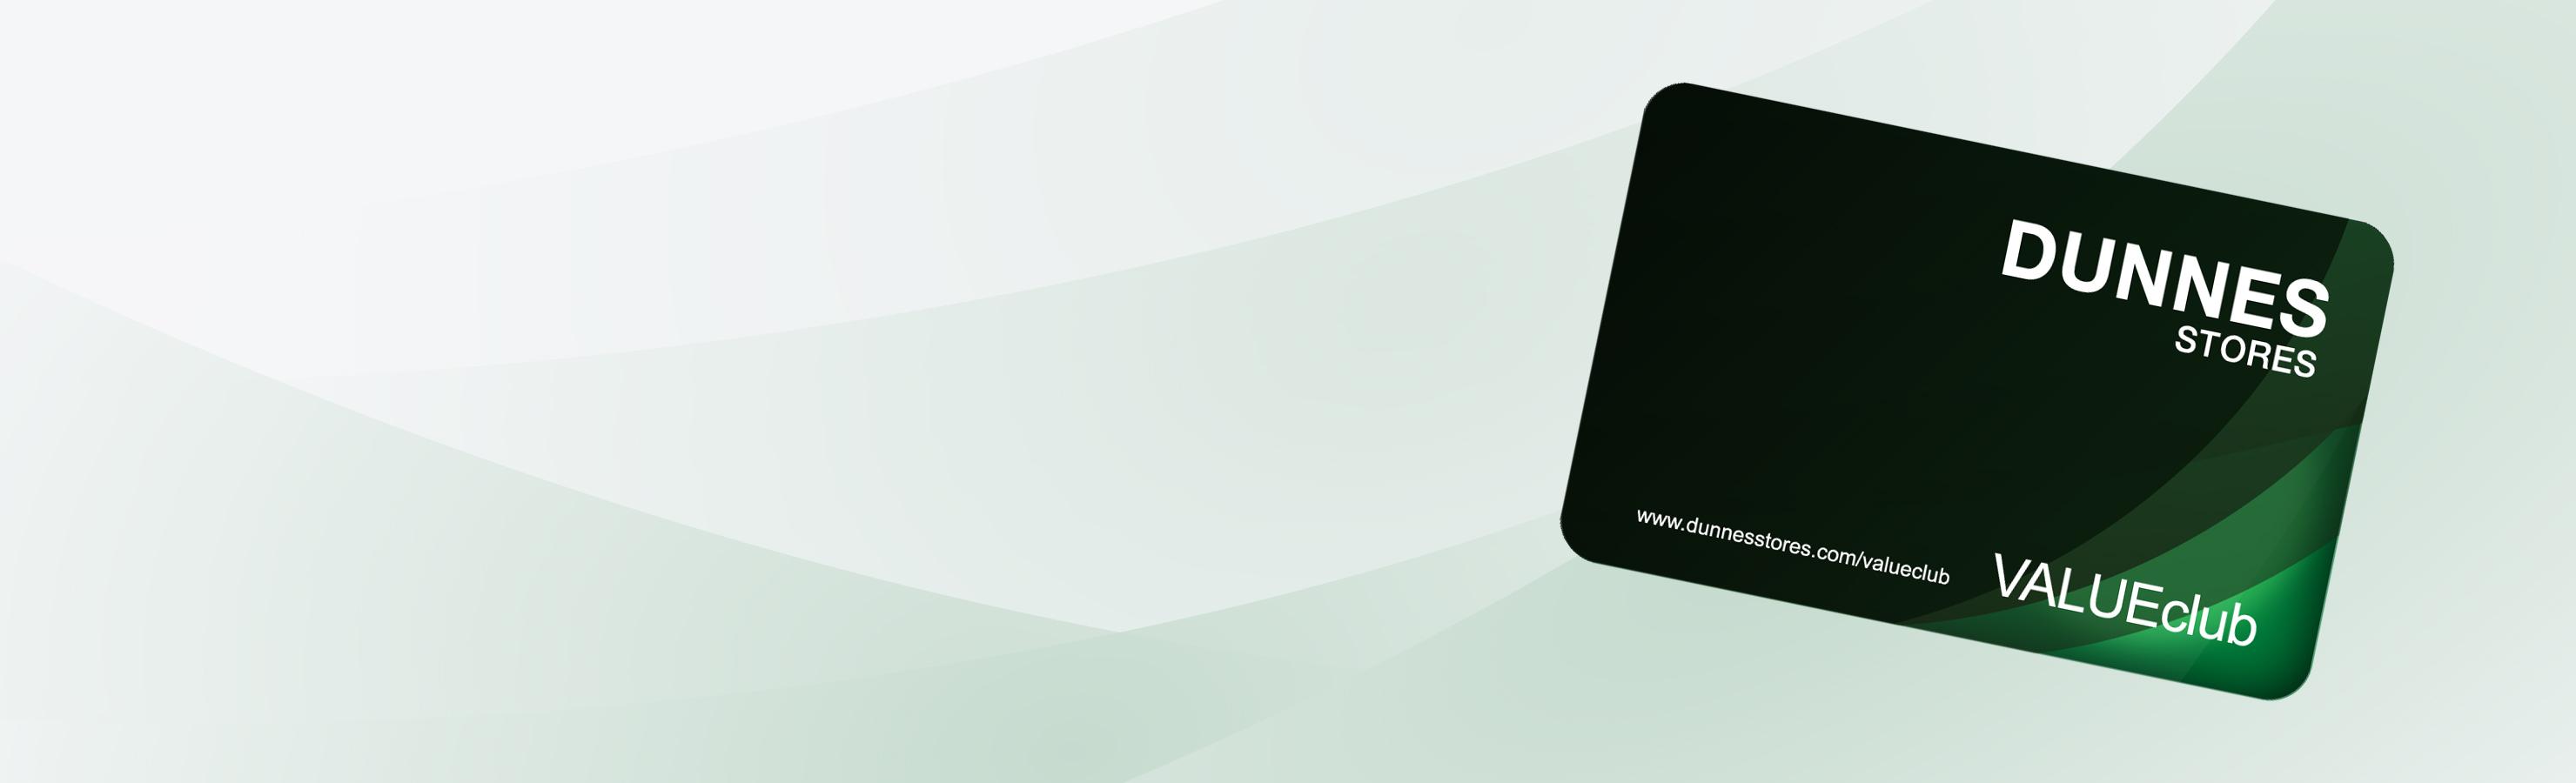 VALUEclub card and app